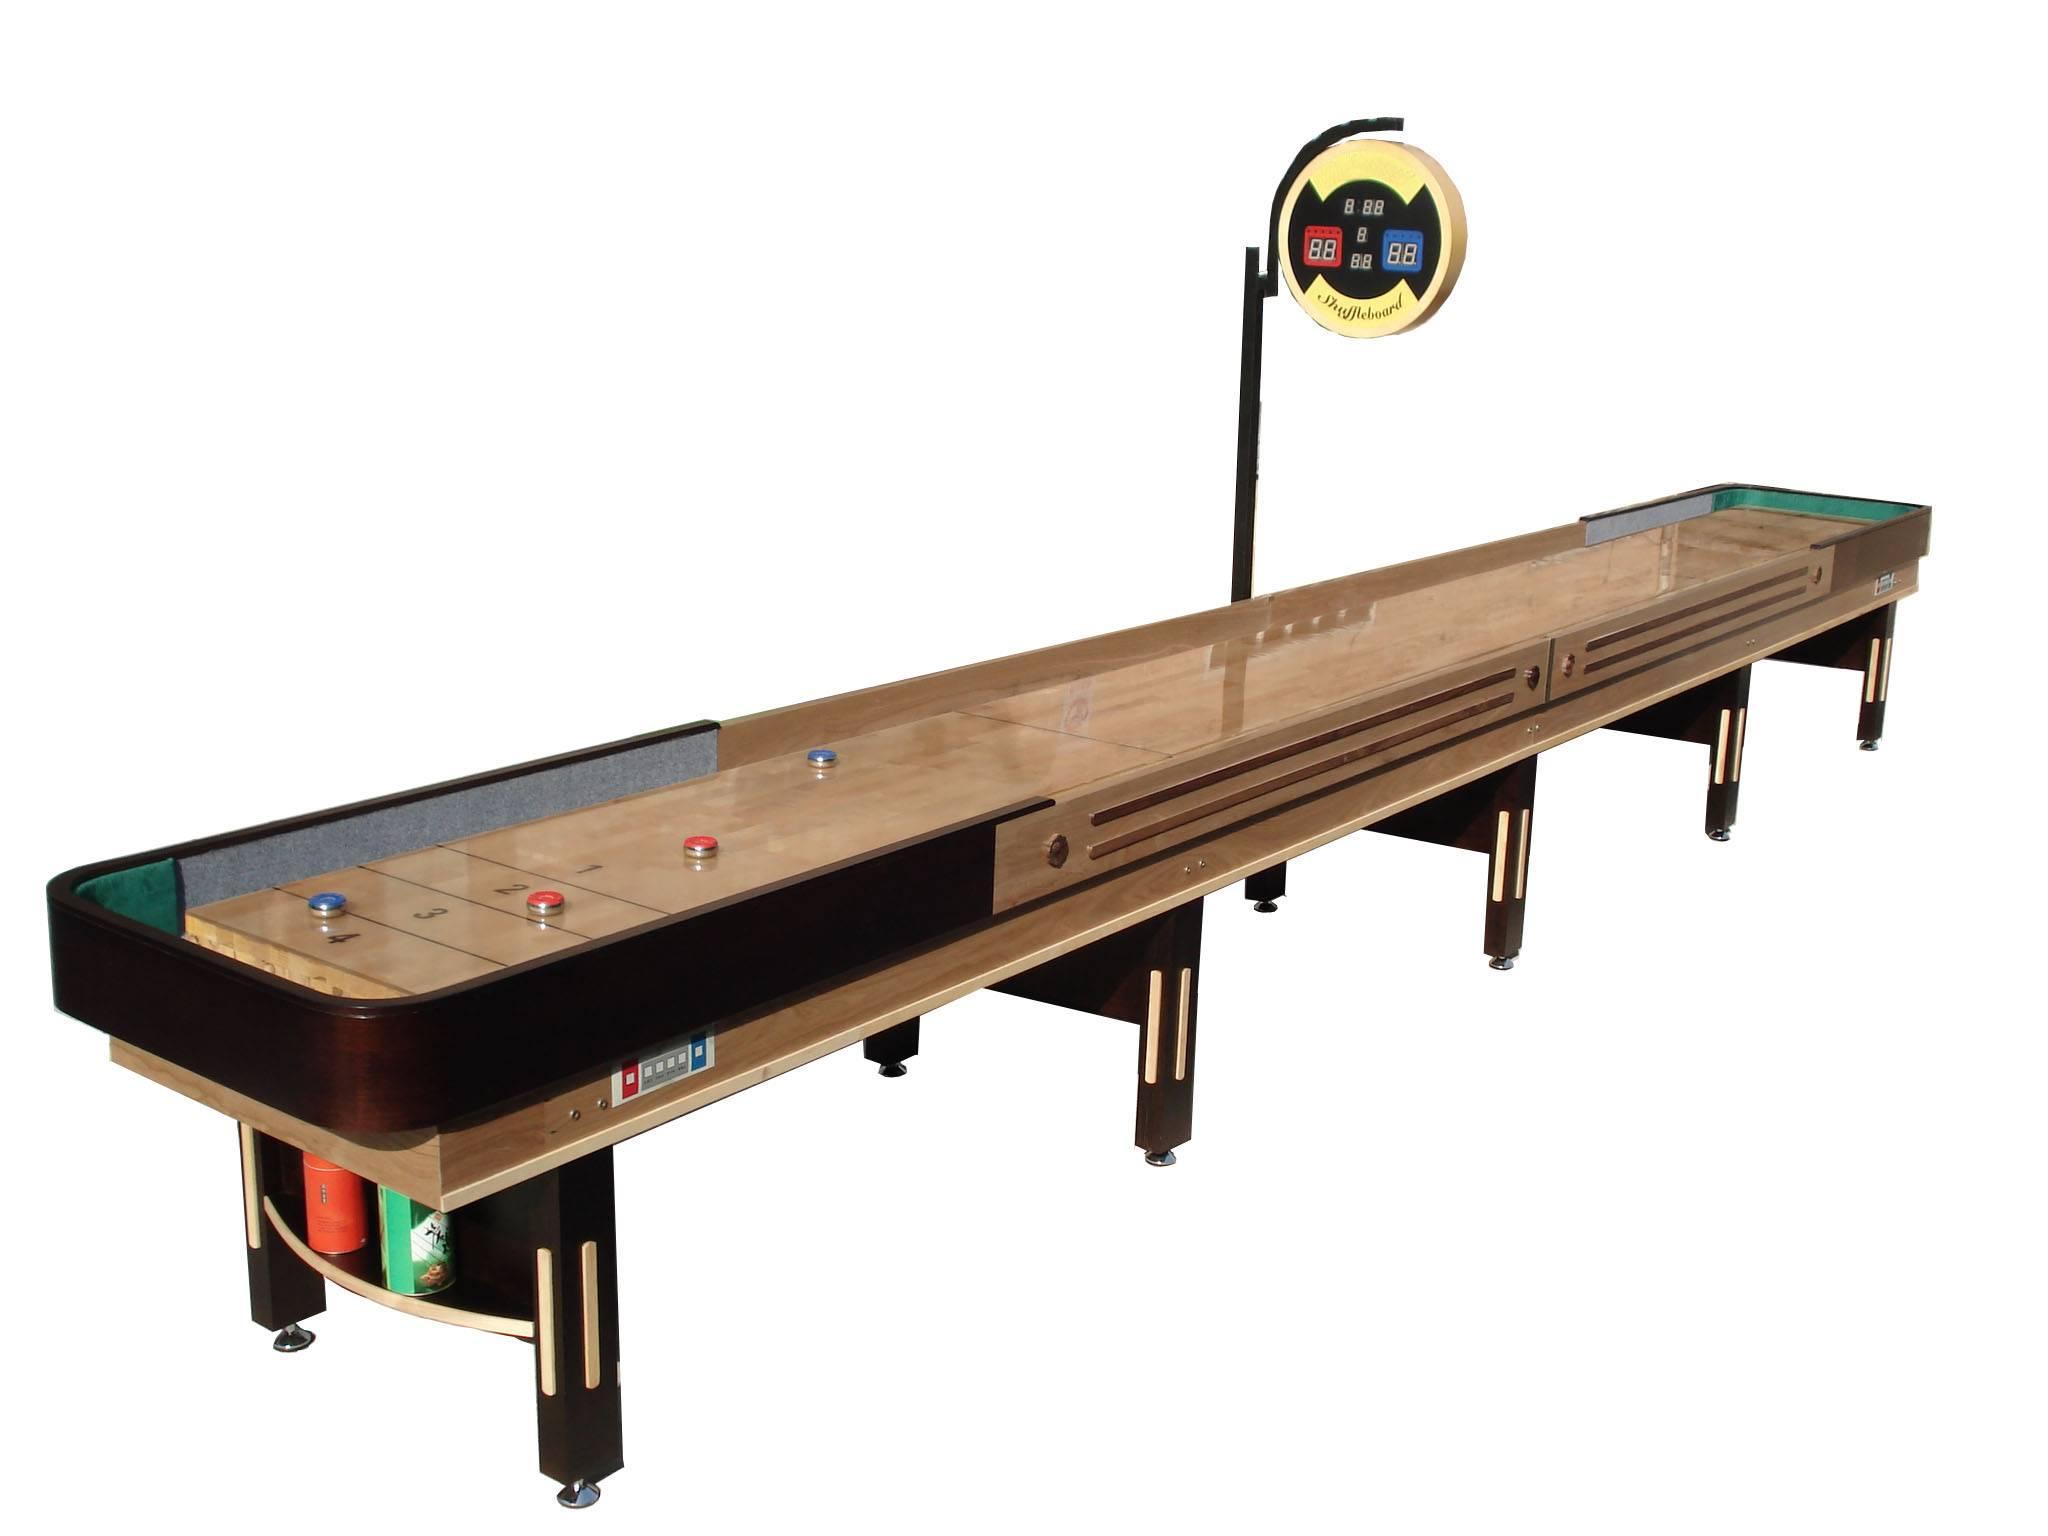 22ft shuffleboard table